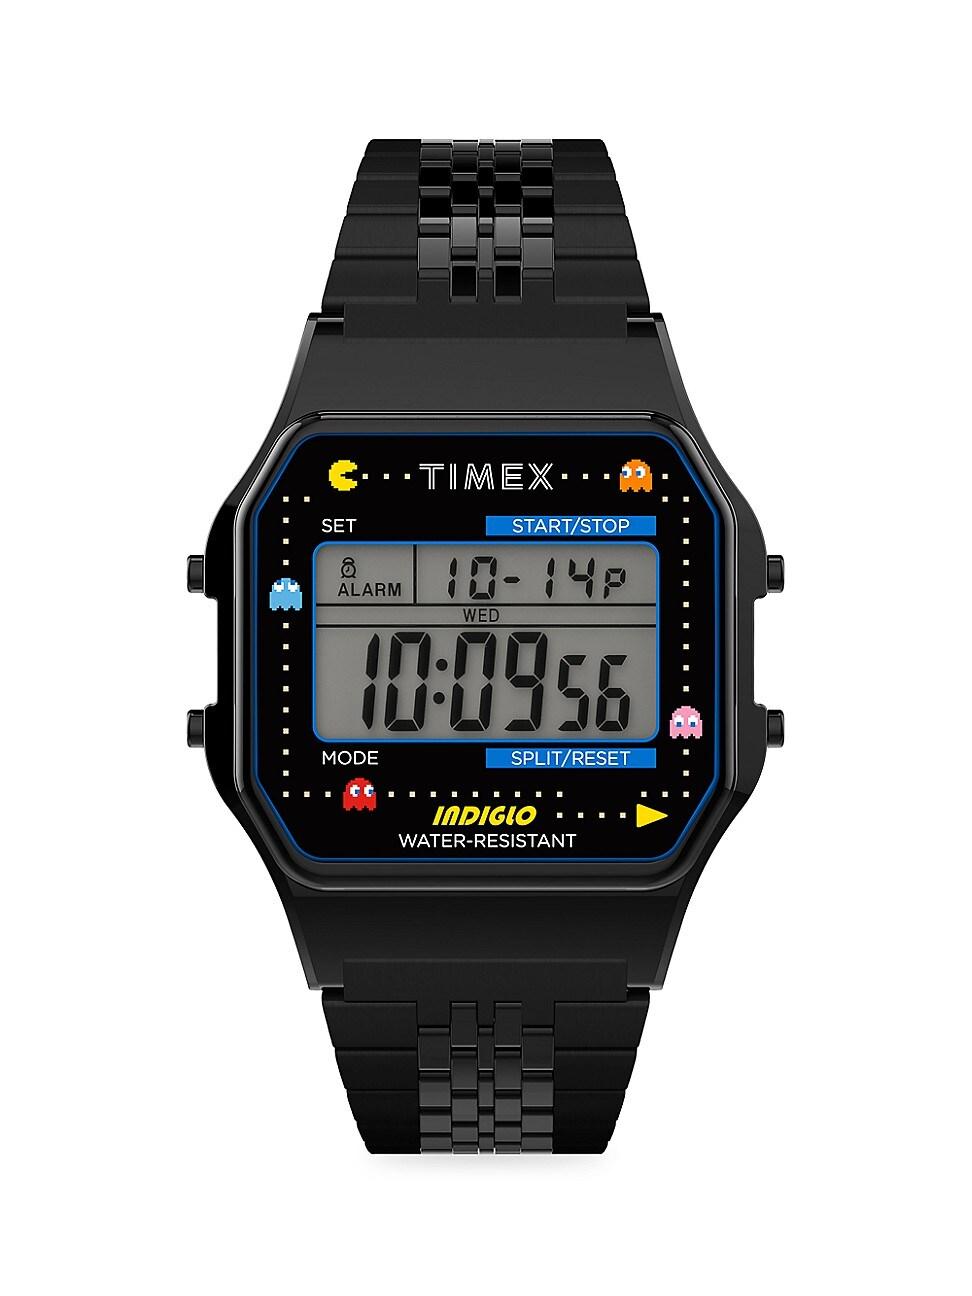 TIMEX T80 X PAC-MAN™ STAINLESS STEEL BRACELET WATCH